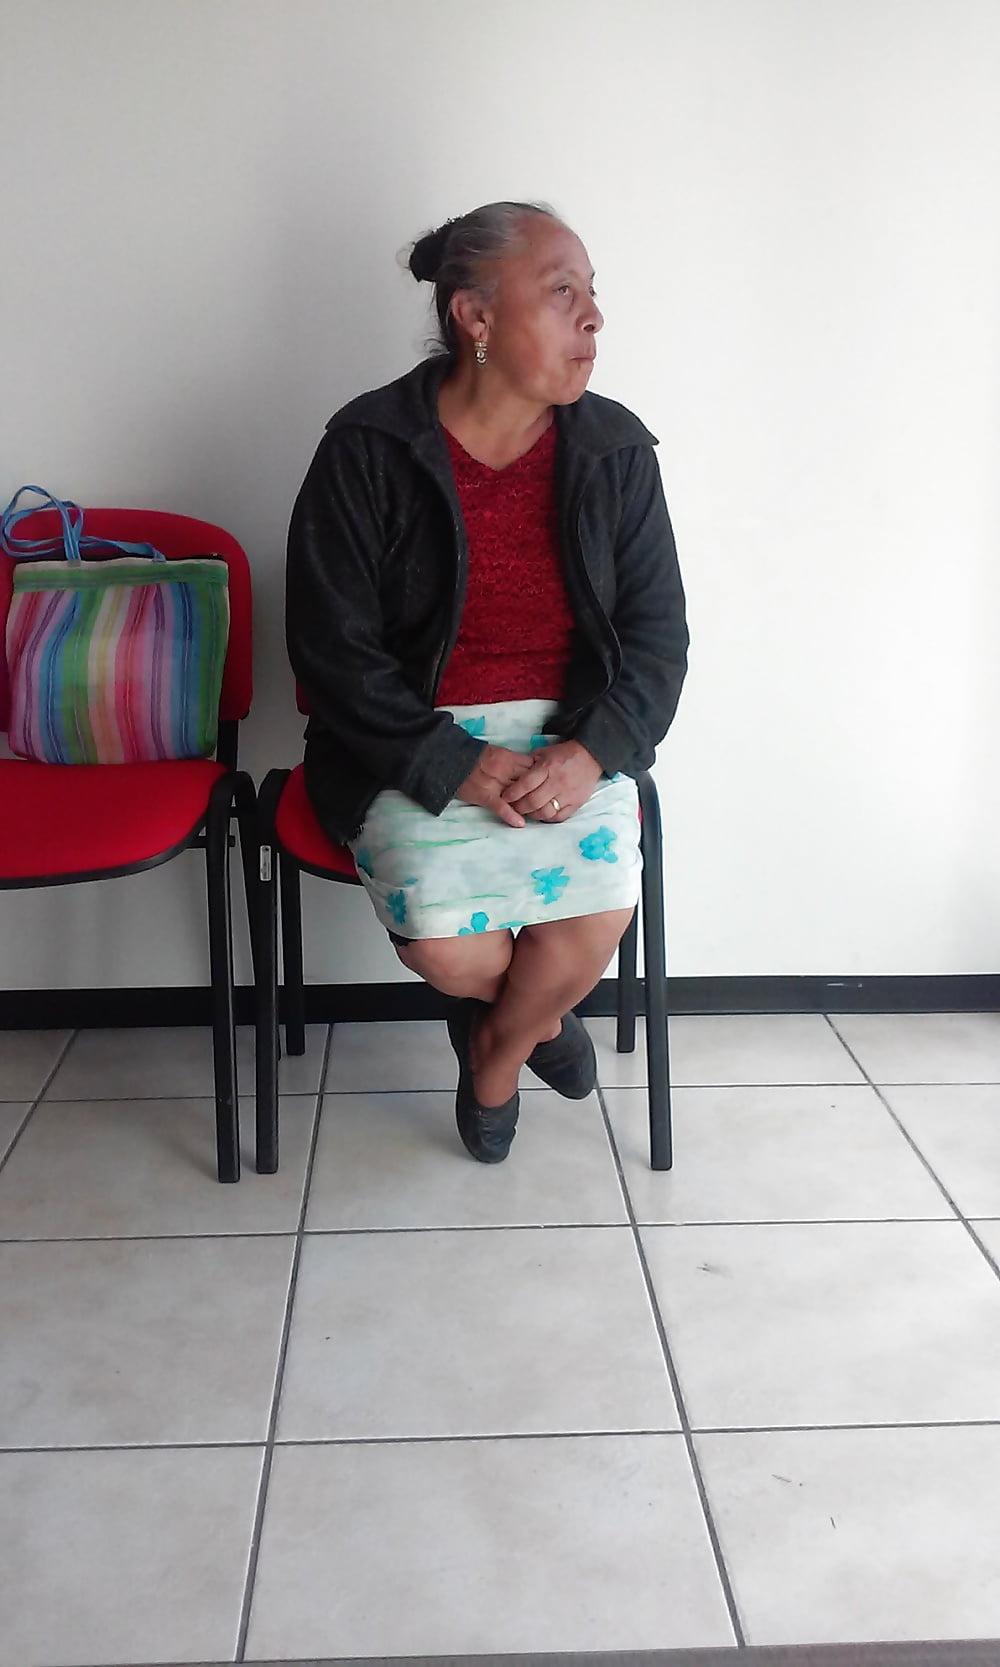 Ancianas Culonas abuela piernuda - 13 pics | xhamster